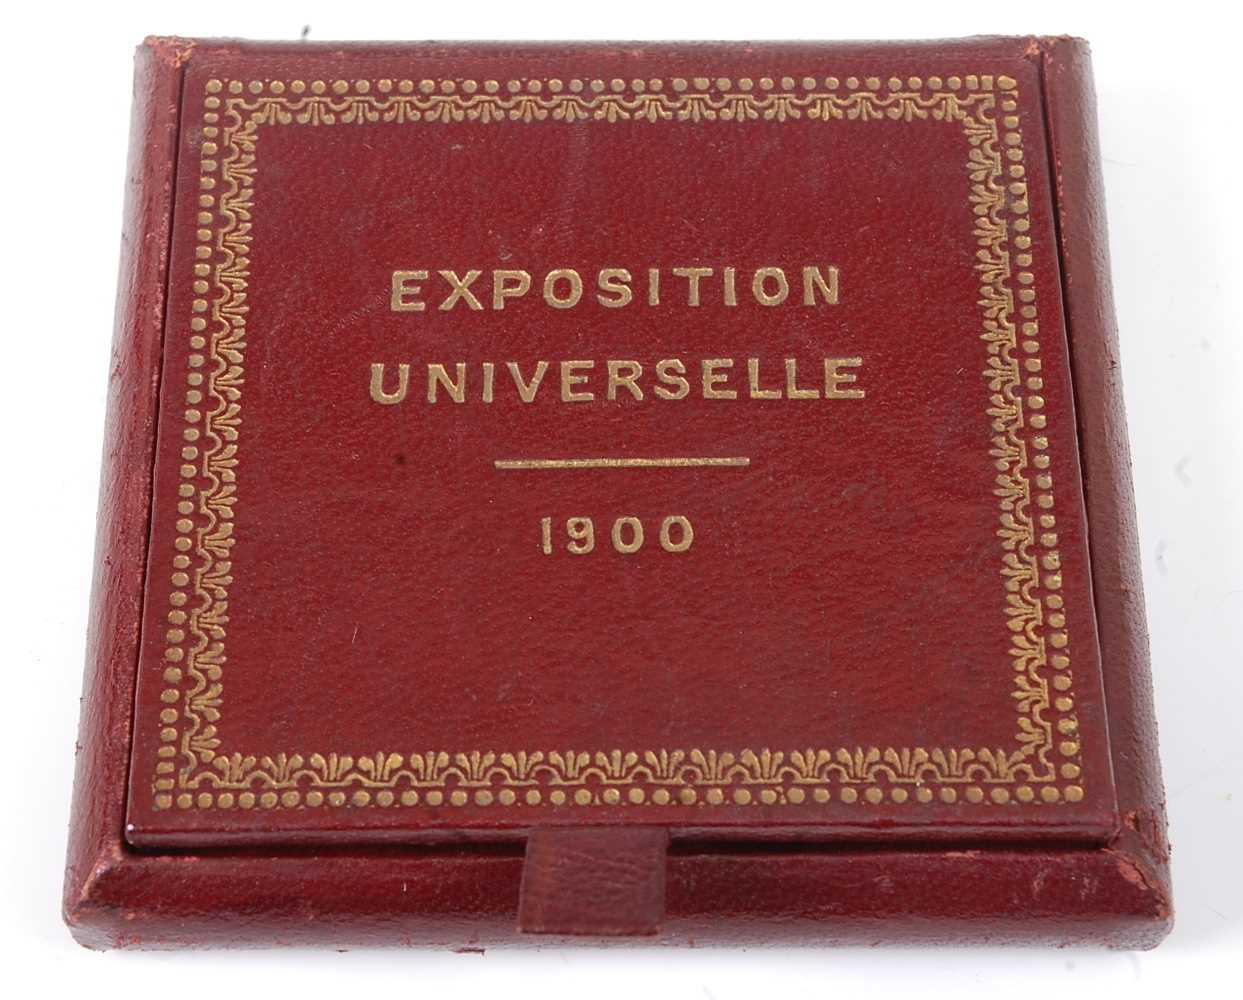 France, Paris 1900 Exposition Universelle Internationale bronze medal, designed by Chaplain, obv; - Image 5 of 5